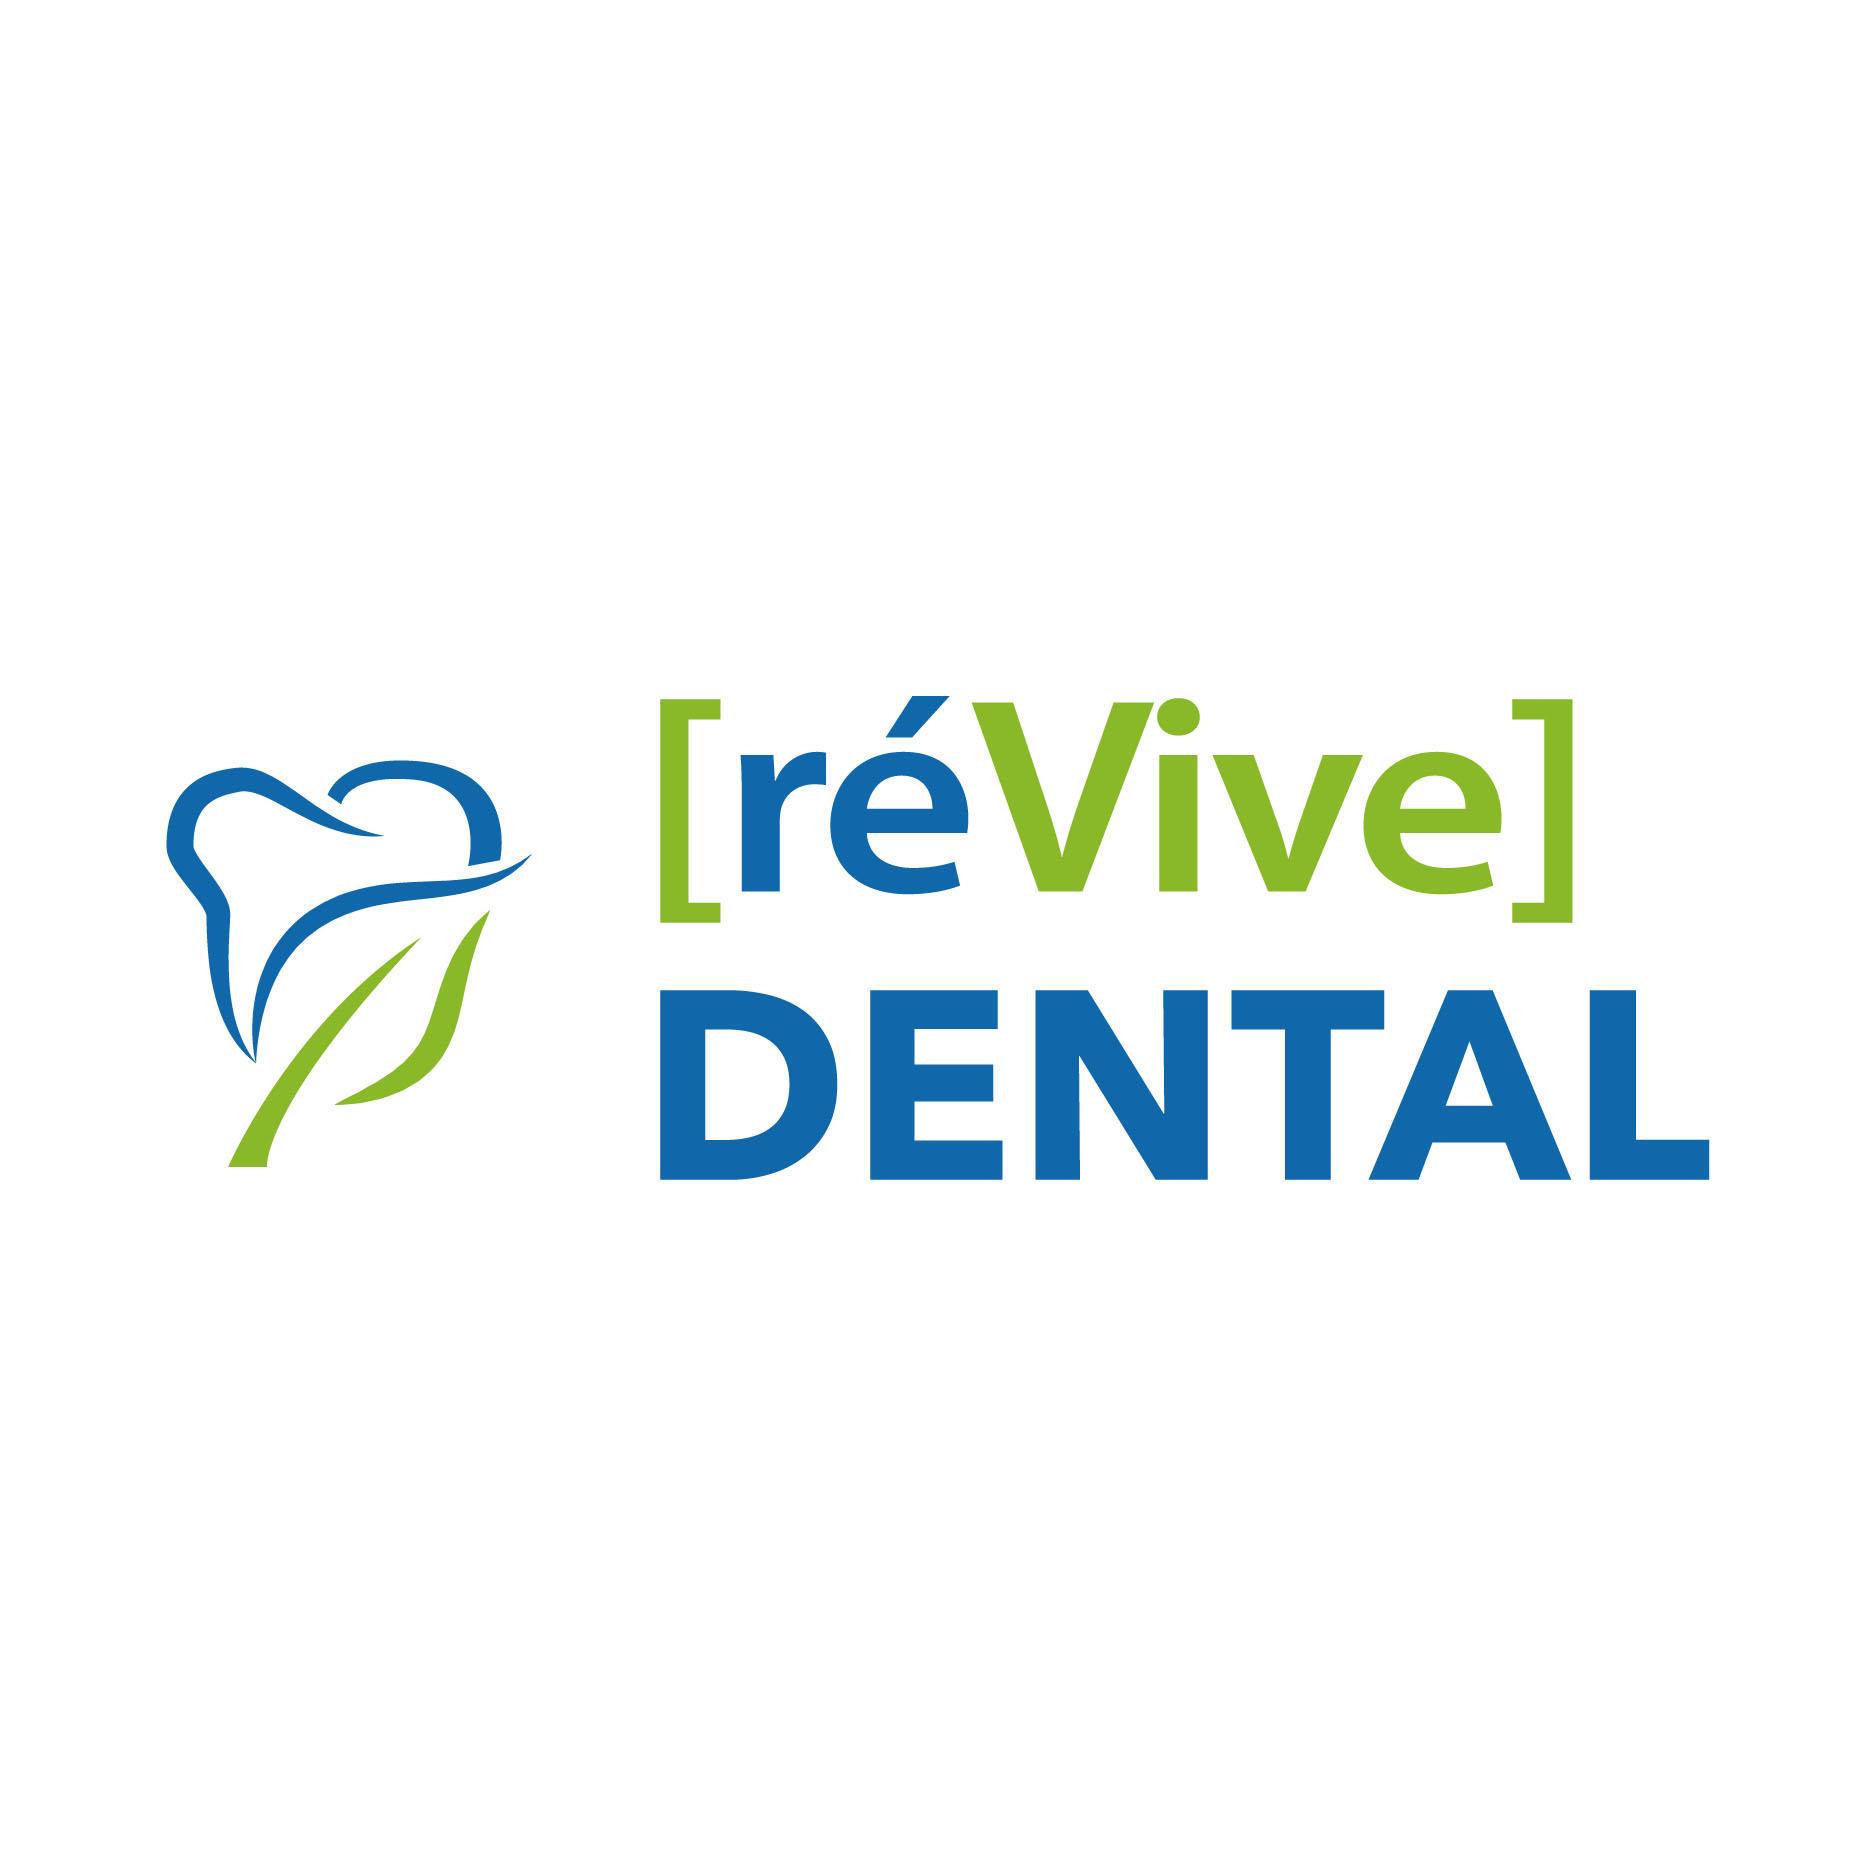 Revive Dental Medicaid Family, Cosmetic Emergency Dentist